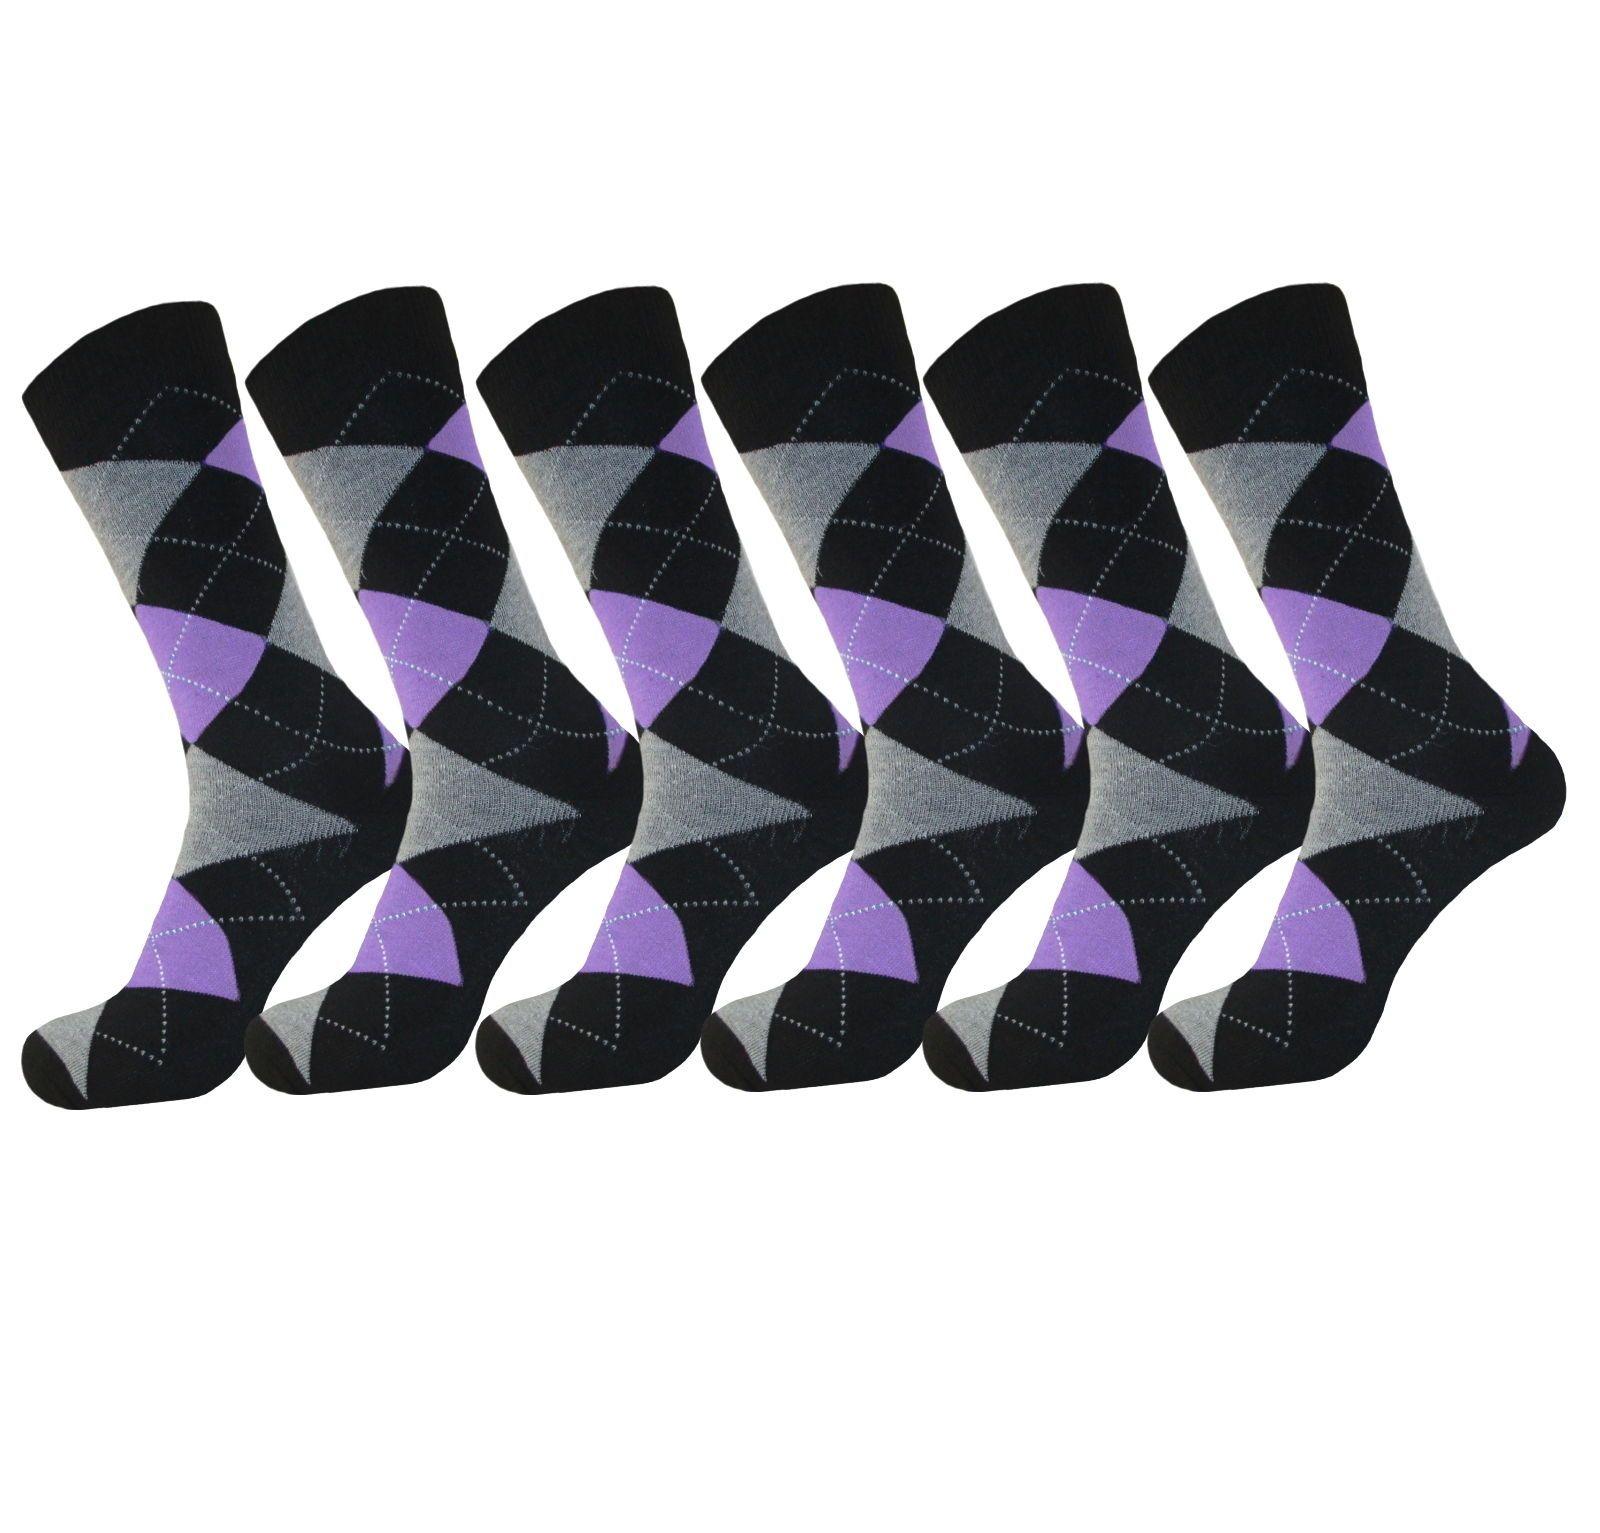 Purple dress socks   Pk Argyle Diamond PURPLE Wedding Dress Socks Fashion Cotton Blend